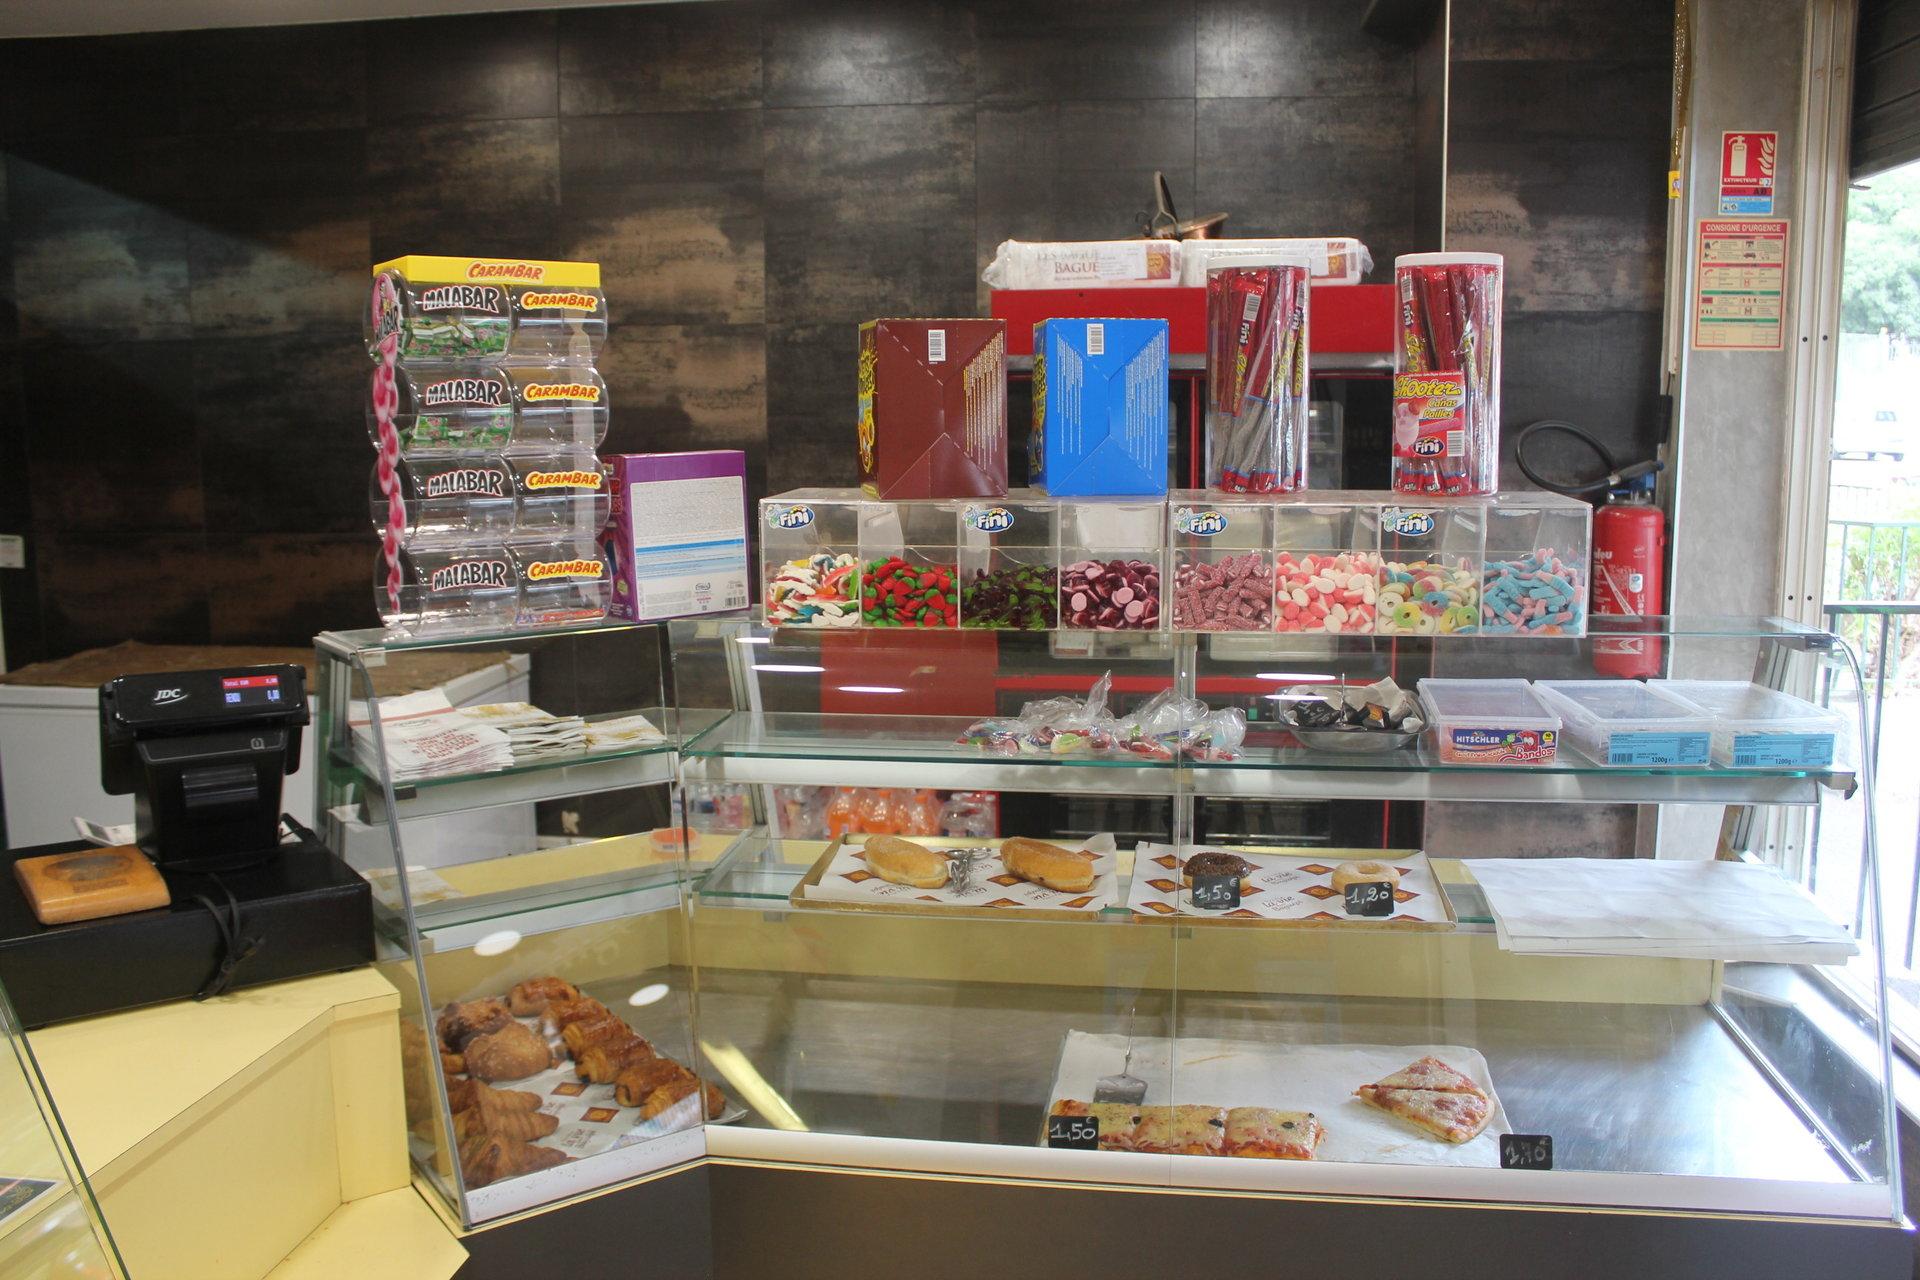 Fonds de commerce boulangerie Ariane